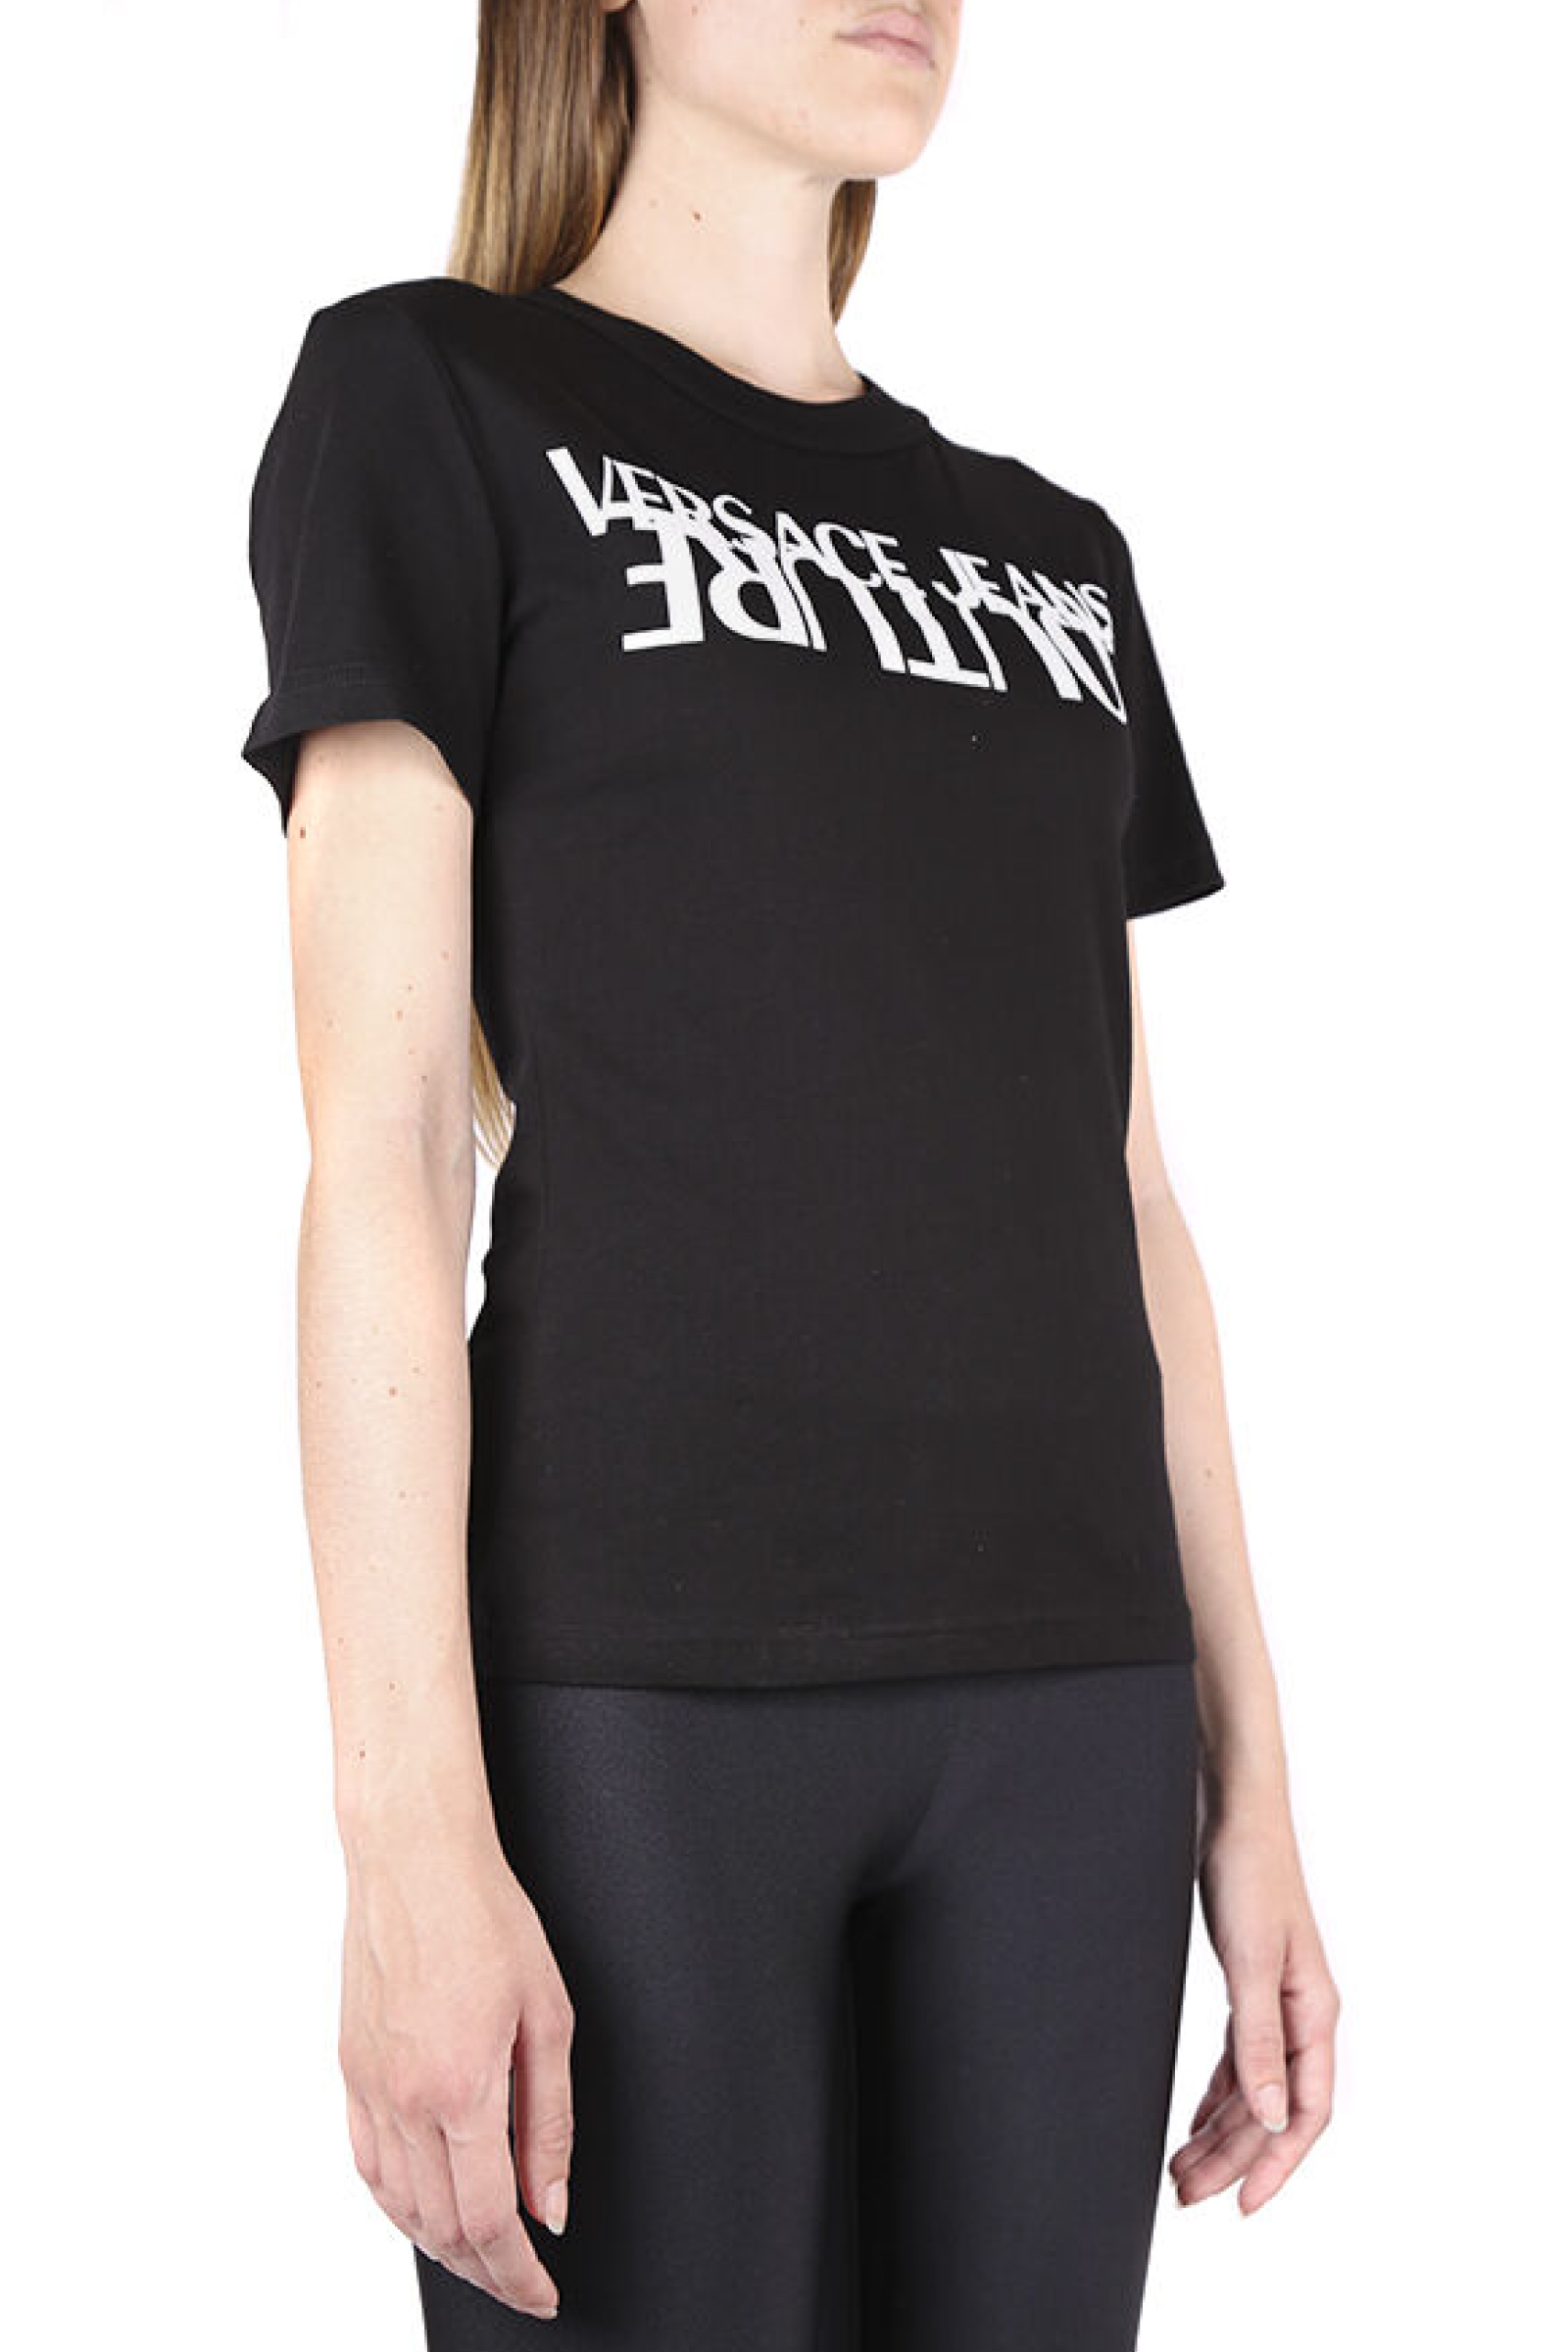 VERSACE JEANS COUTURE Women's T-Shirt VERSACE JEANS COUTURE | T-Shirt | B2HZA7KB.30327899 ZDP608